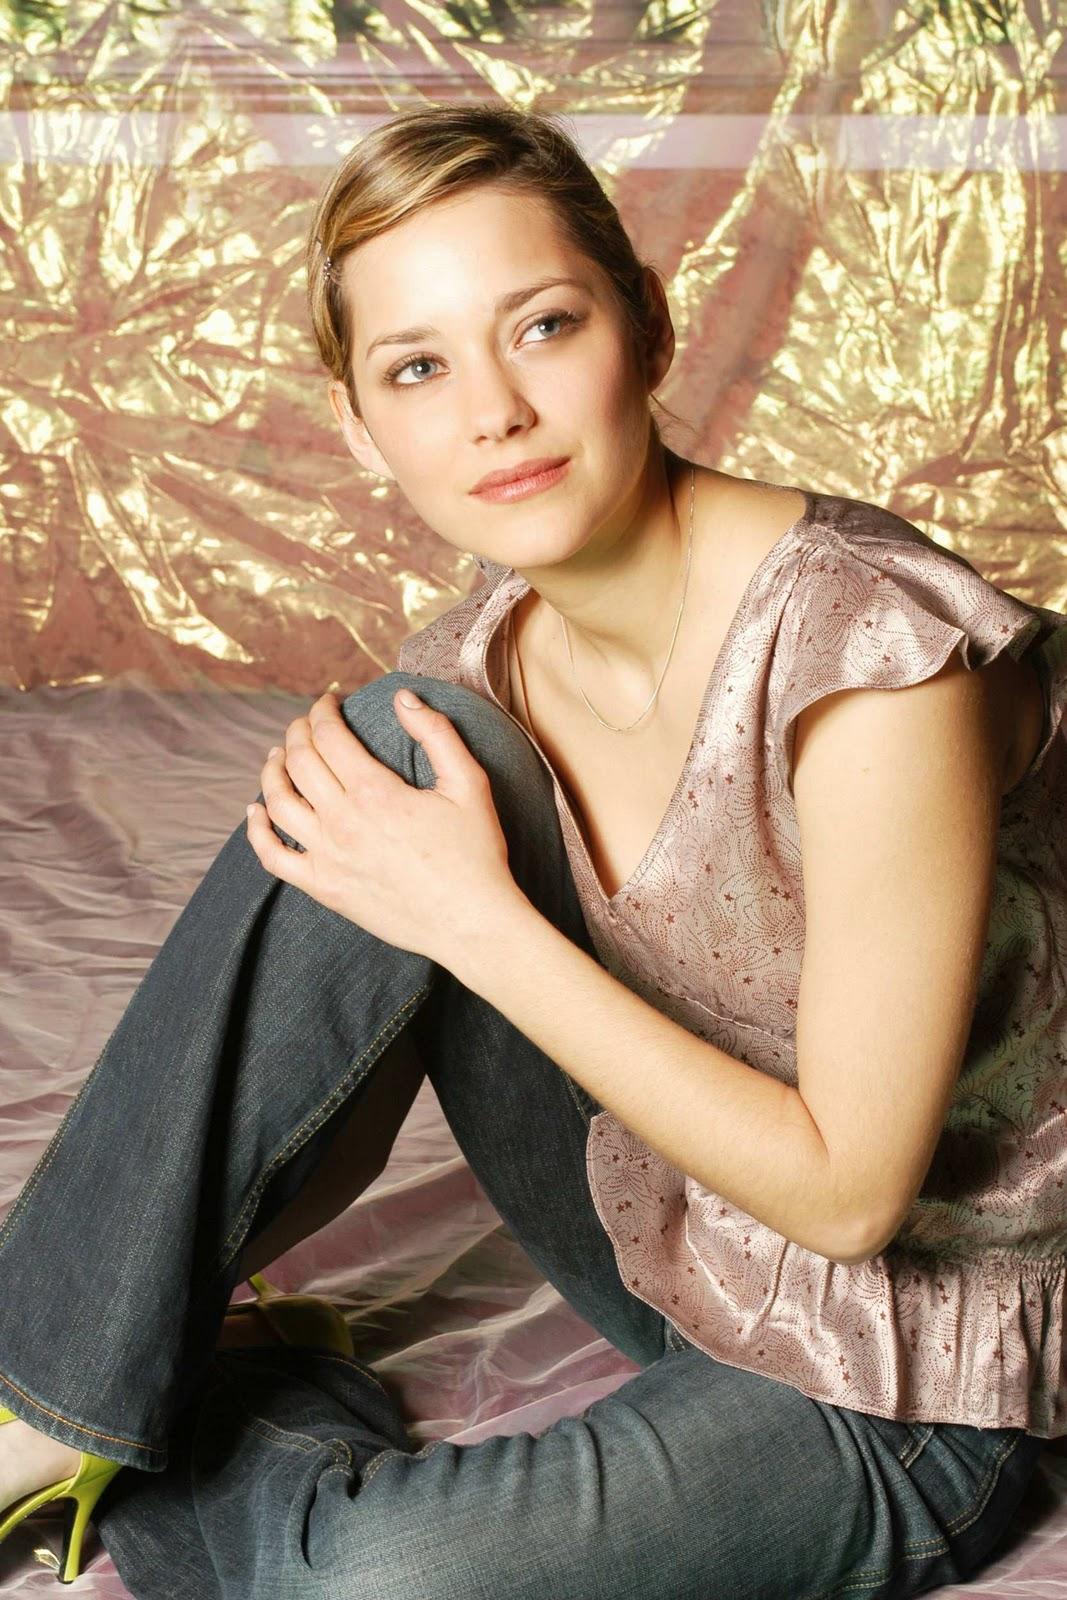 Marion Cotillard - Celebrities Profile - Gallery